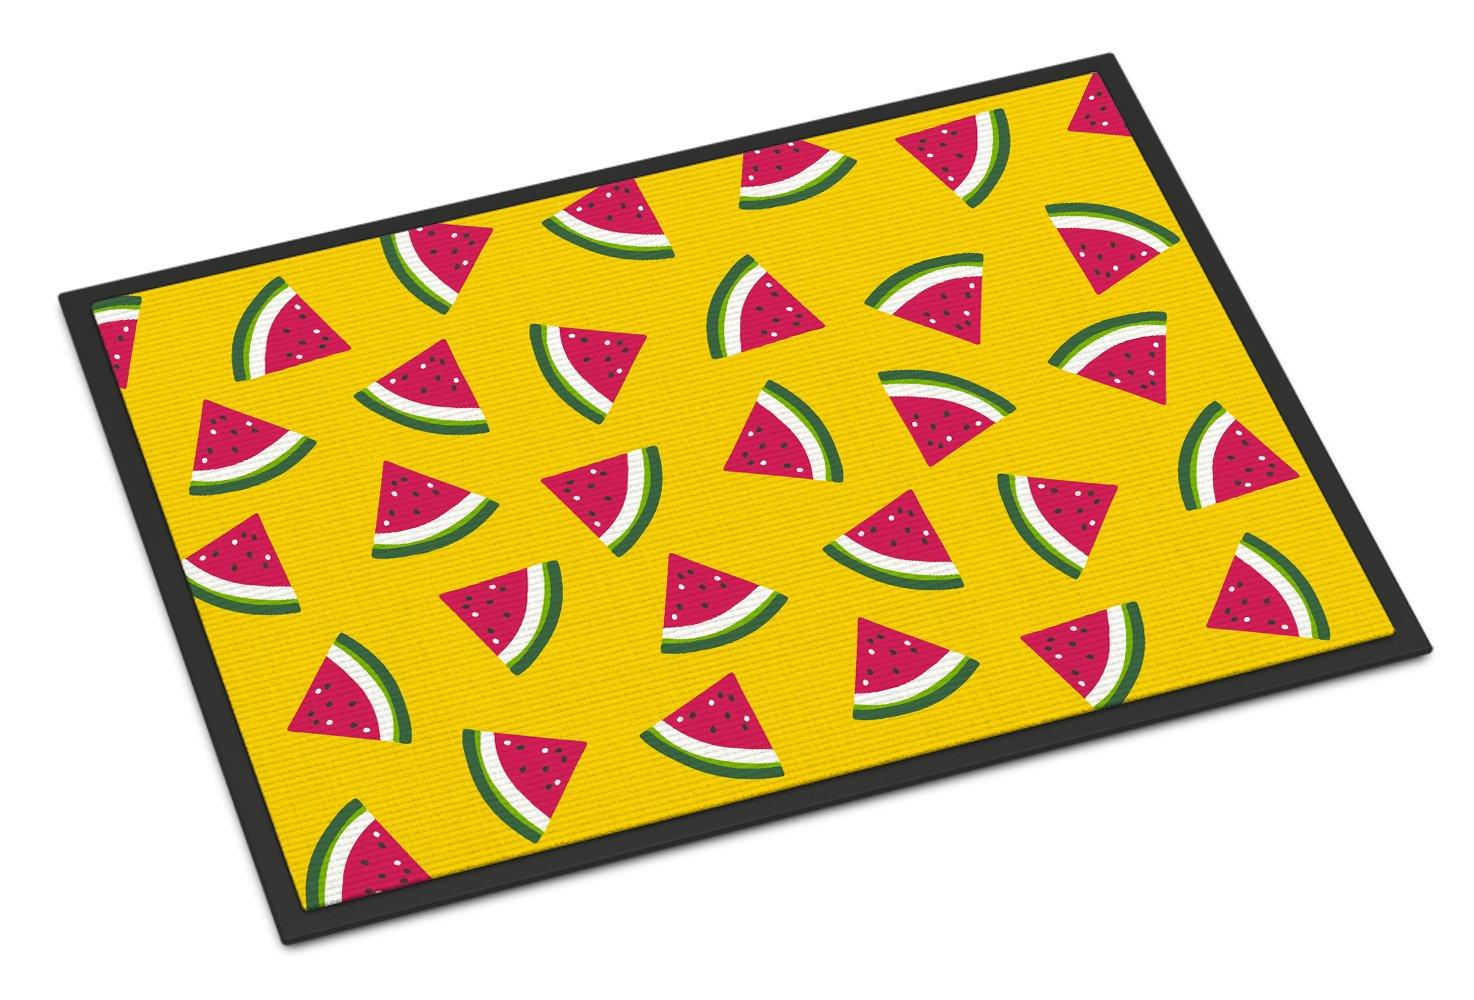 Carolines Treasures Fruits and Vegetables in Yellow Doormat 24 H x 36 W Multicolor